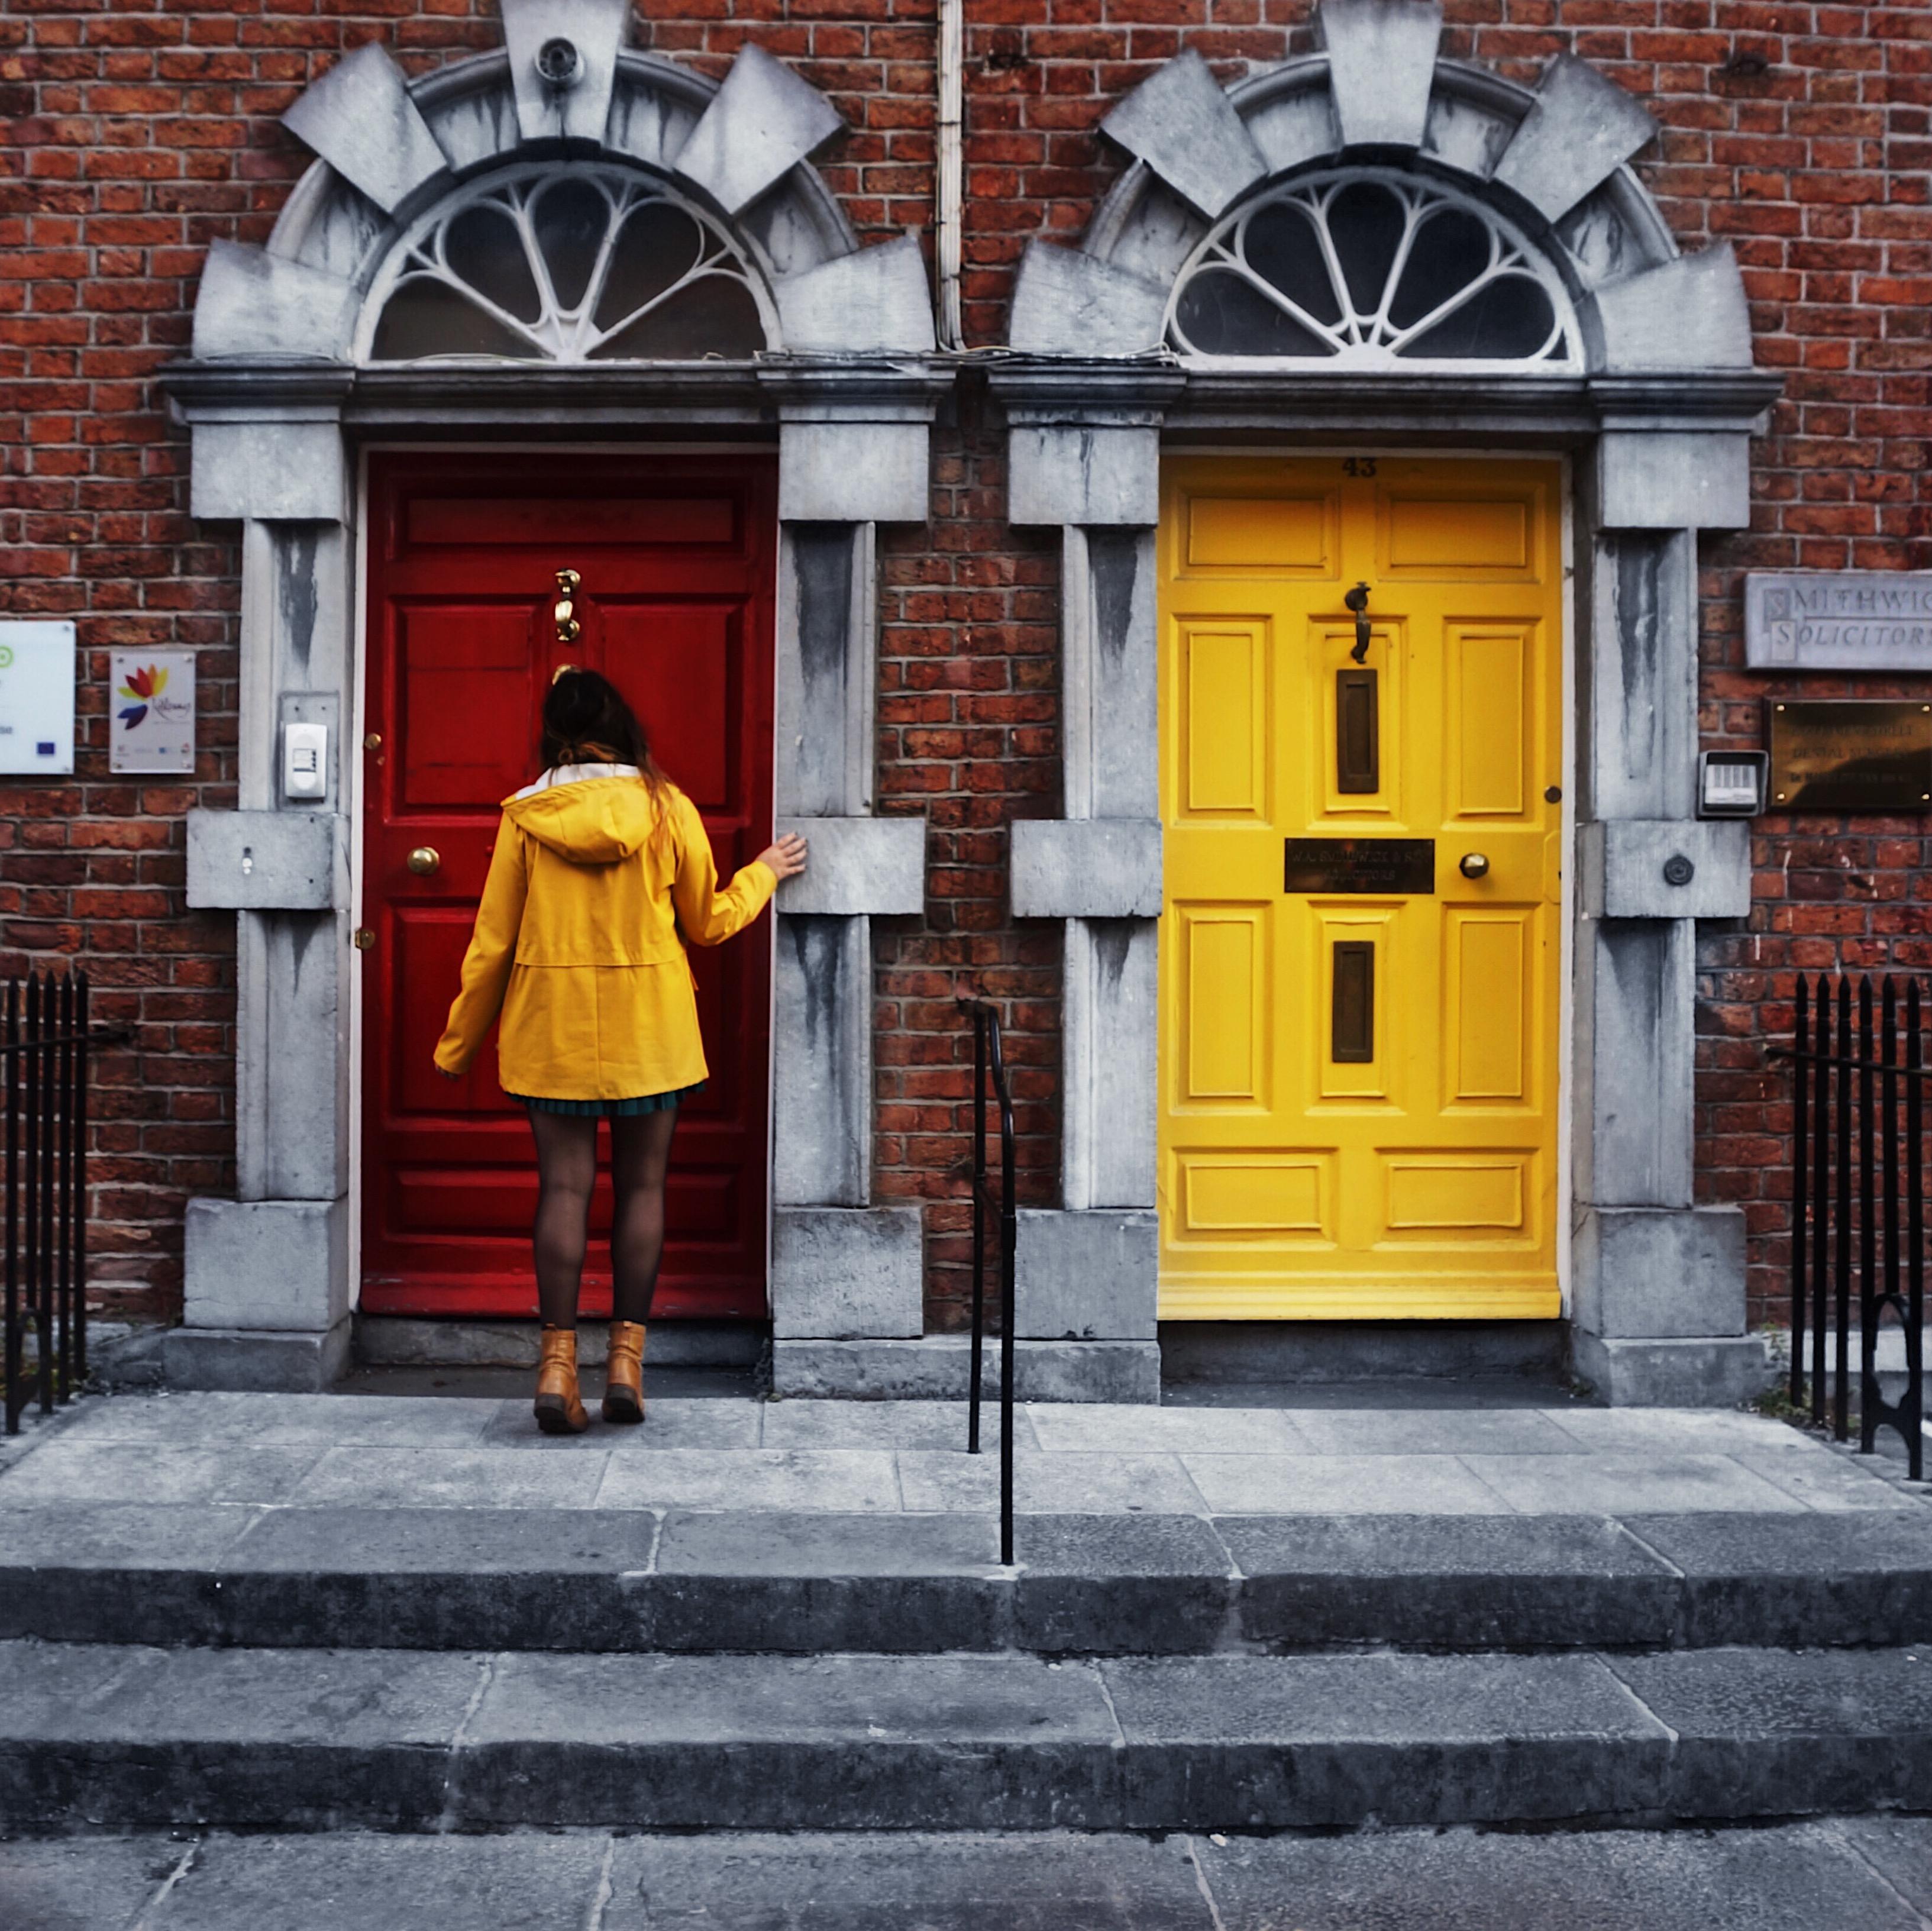 Haustür, Irland, Kilkenny, Irland, bunte Türen